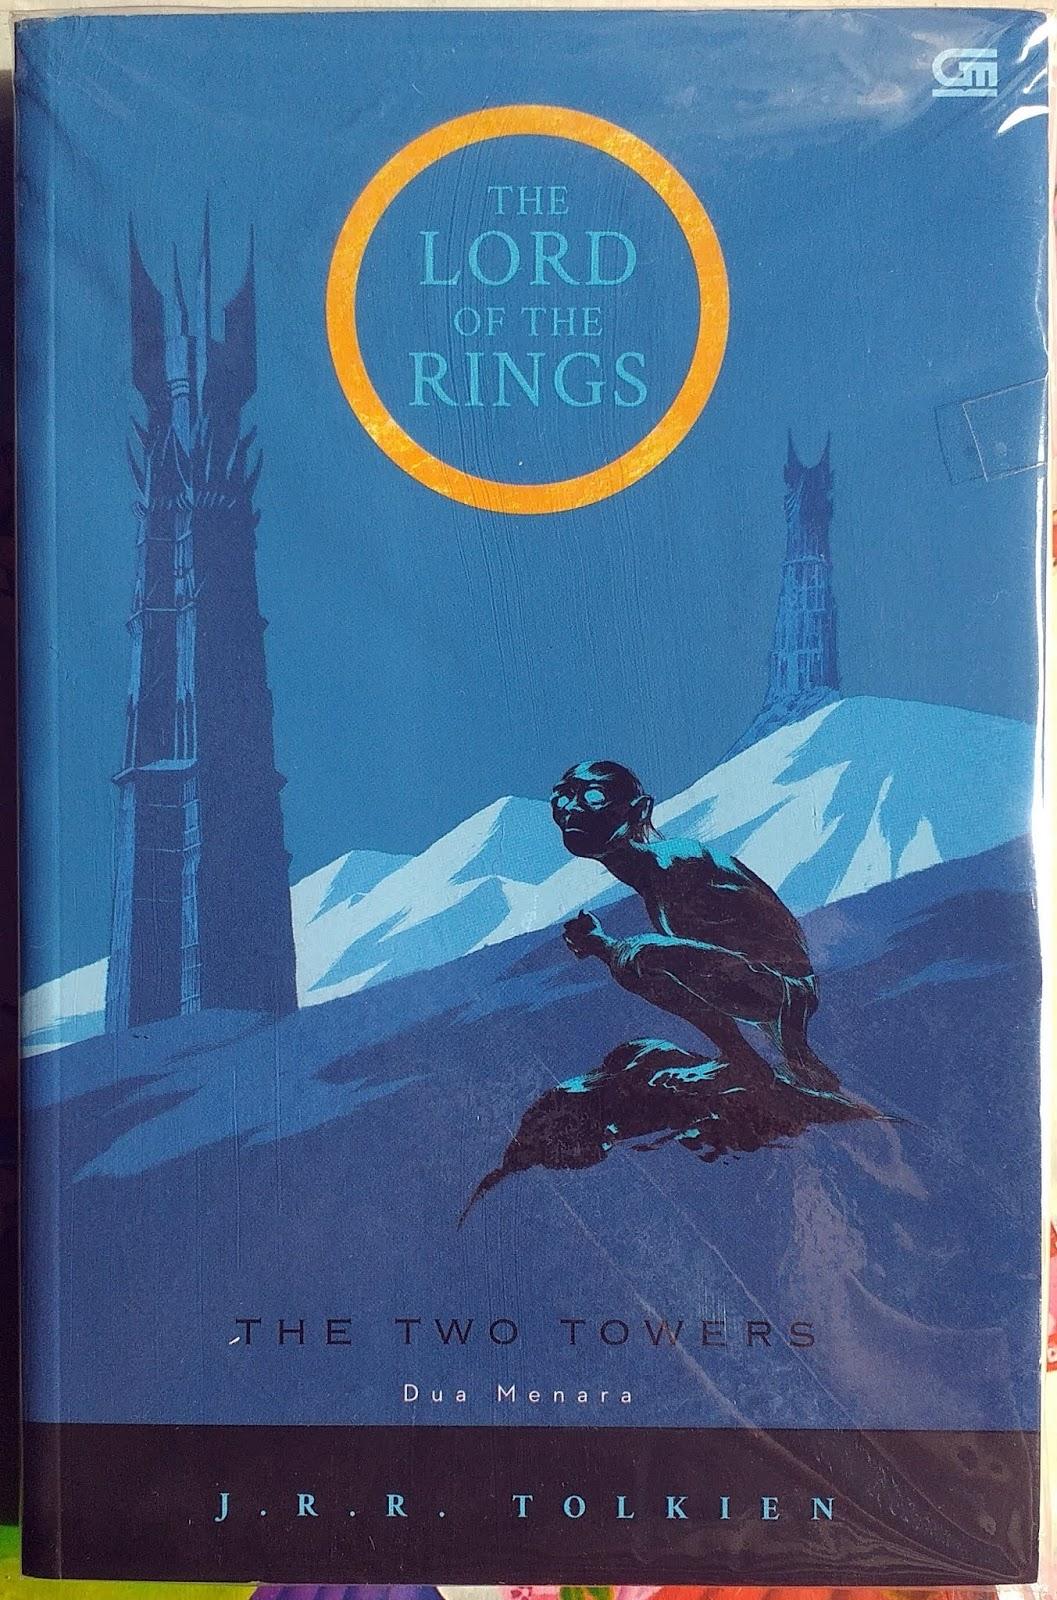 Olak Alik Store Blog Review Novel The Lord Of The Rings The Two Towers By J R R Tolkien Berakhir Menegangkan